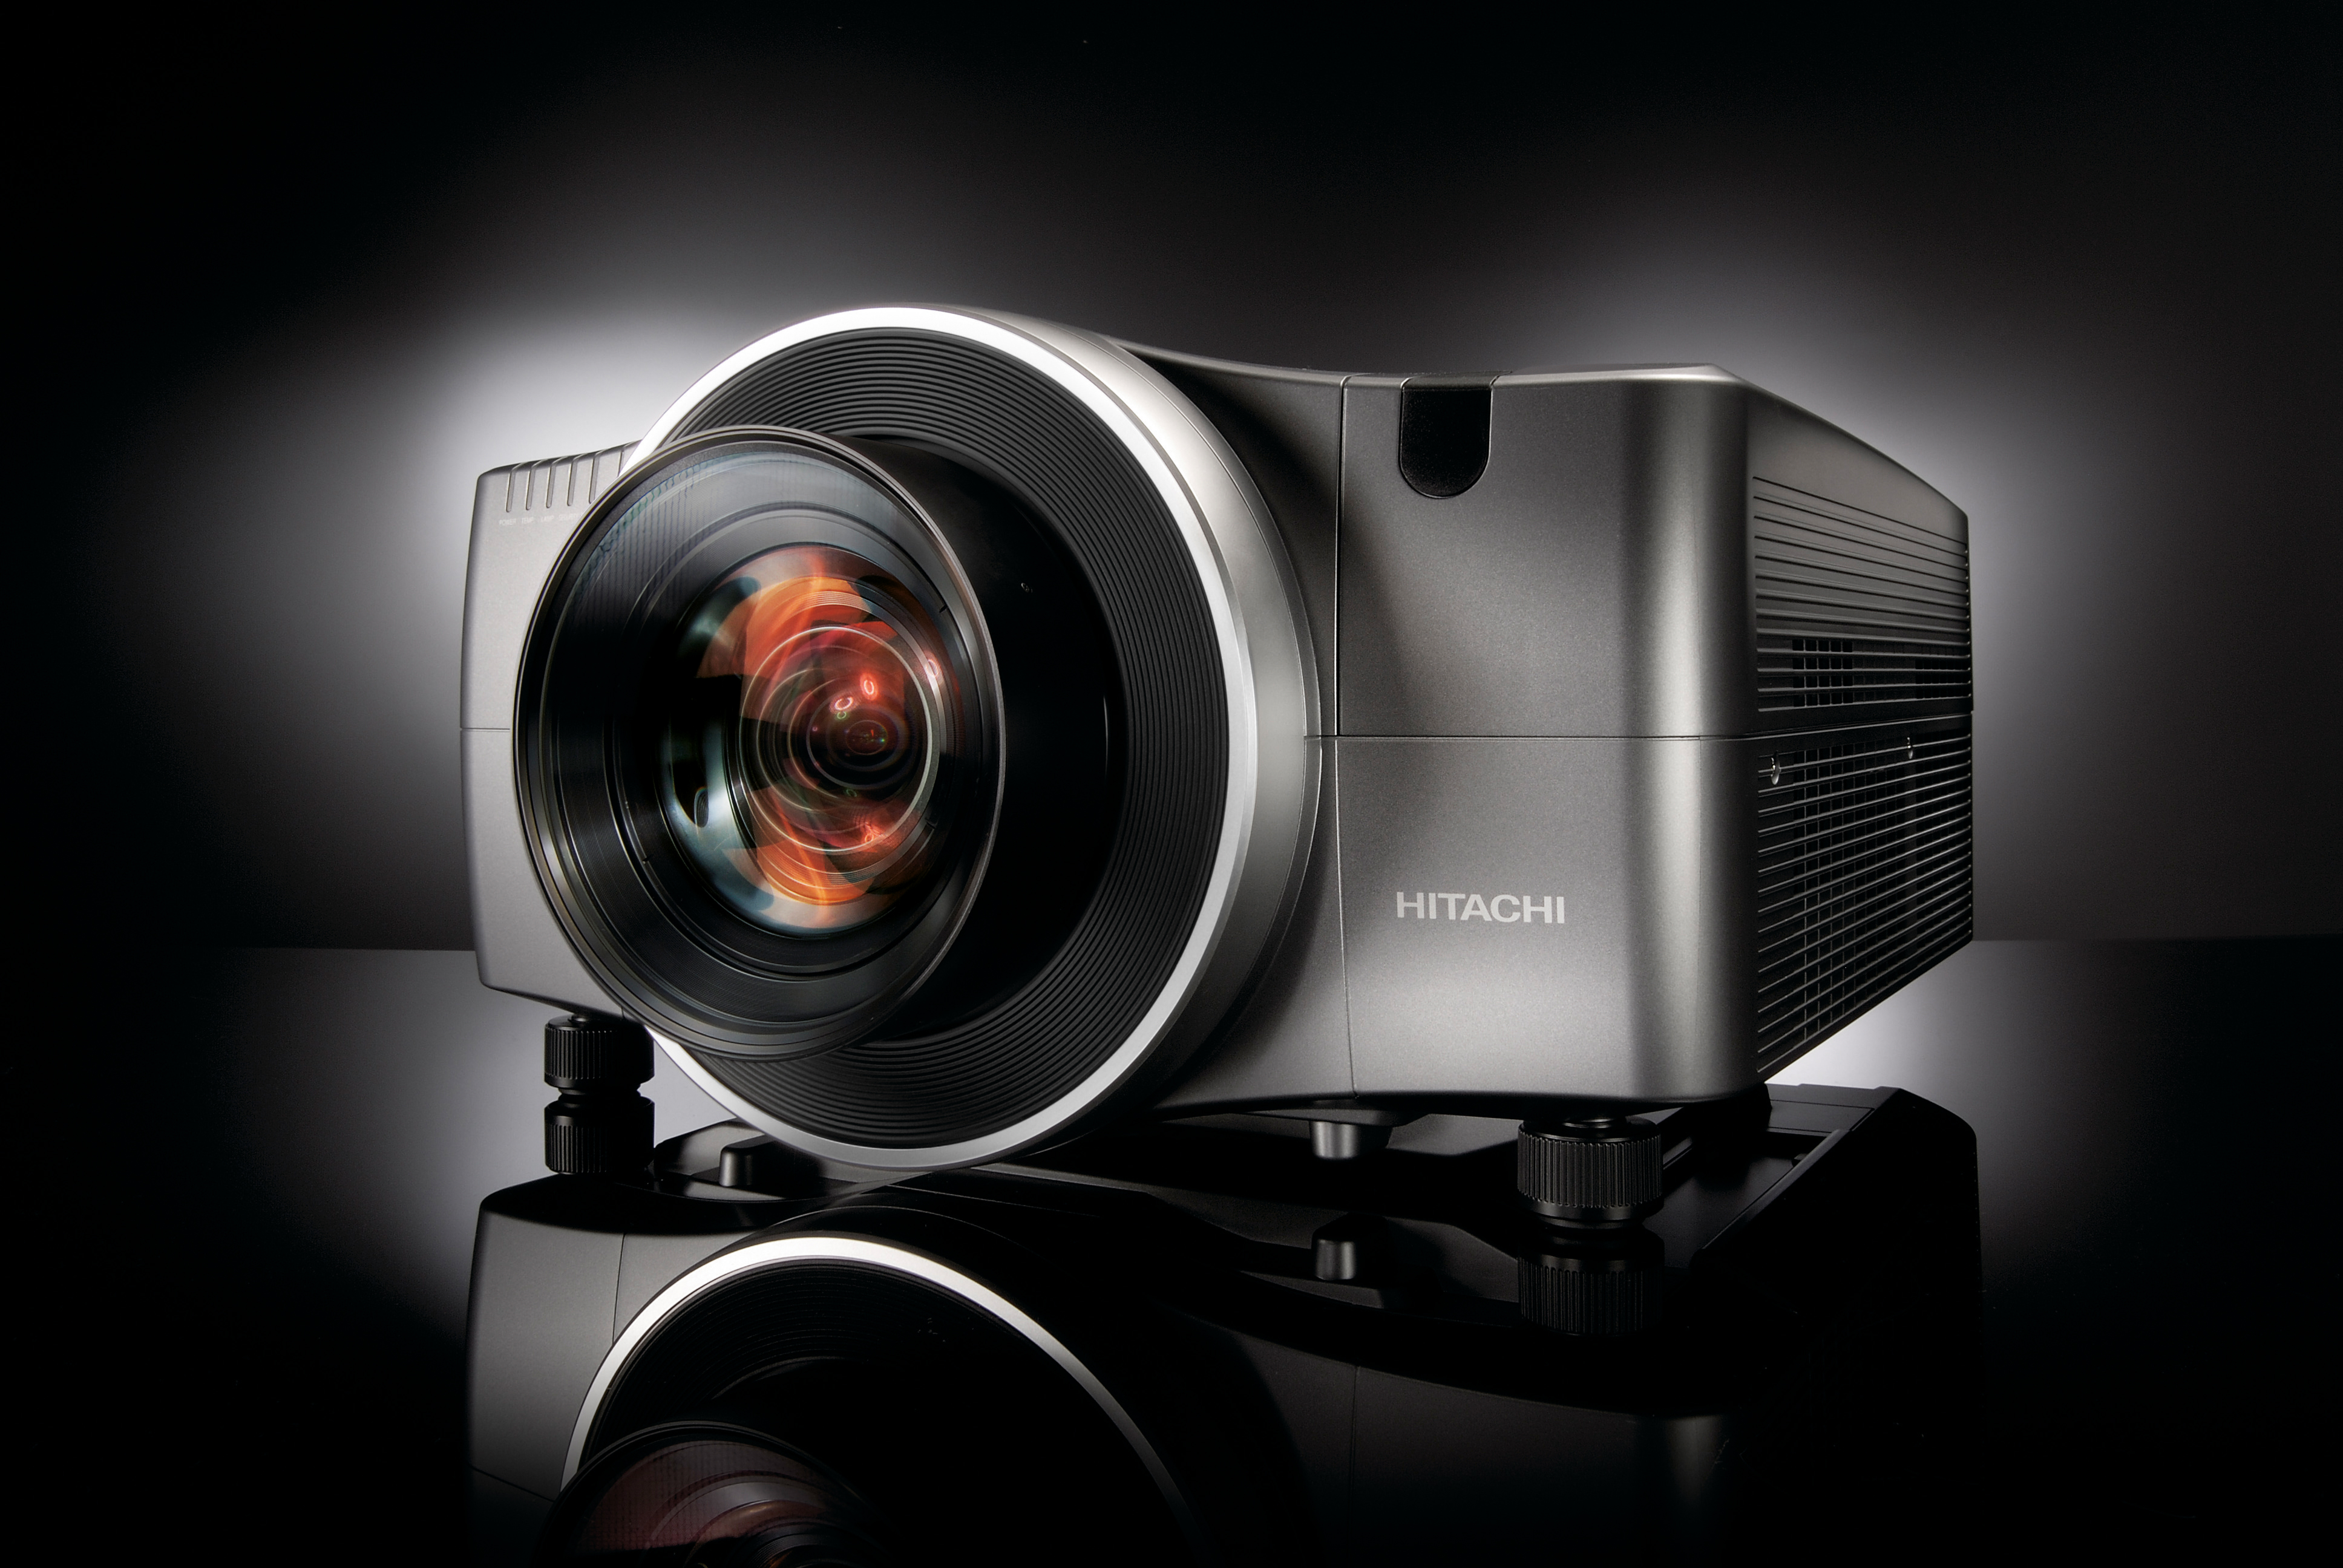 Hitachi Projektoren Cp X10000 Xga Lcd Beamer X4041wn Wifi Projector Projektor